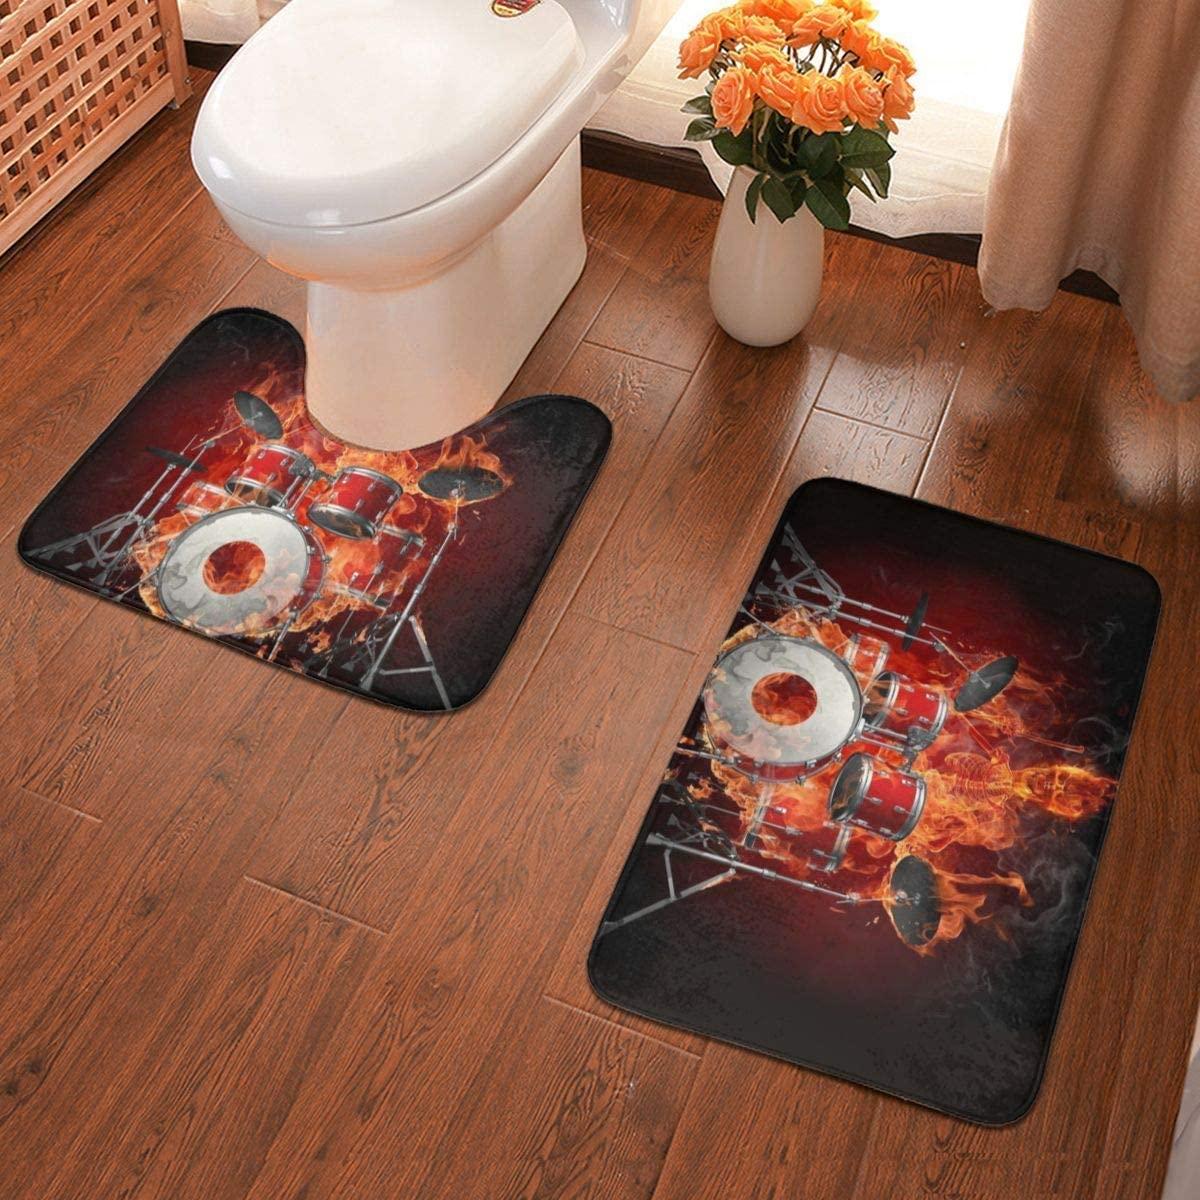 Bathroom Rug Skull Drums Flannel Bathroom Antiskid Pad Mats Set 2 Piece Soft Pads Bath Mat + Water Absorption Contour